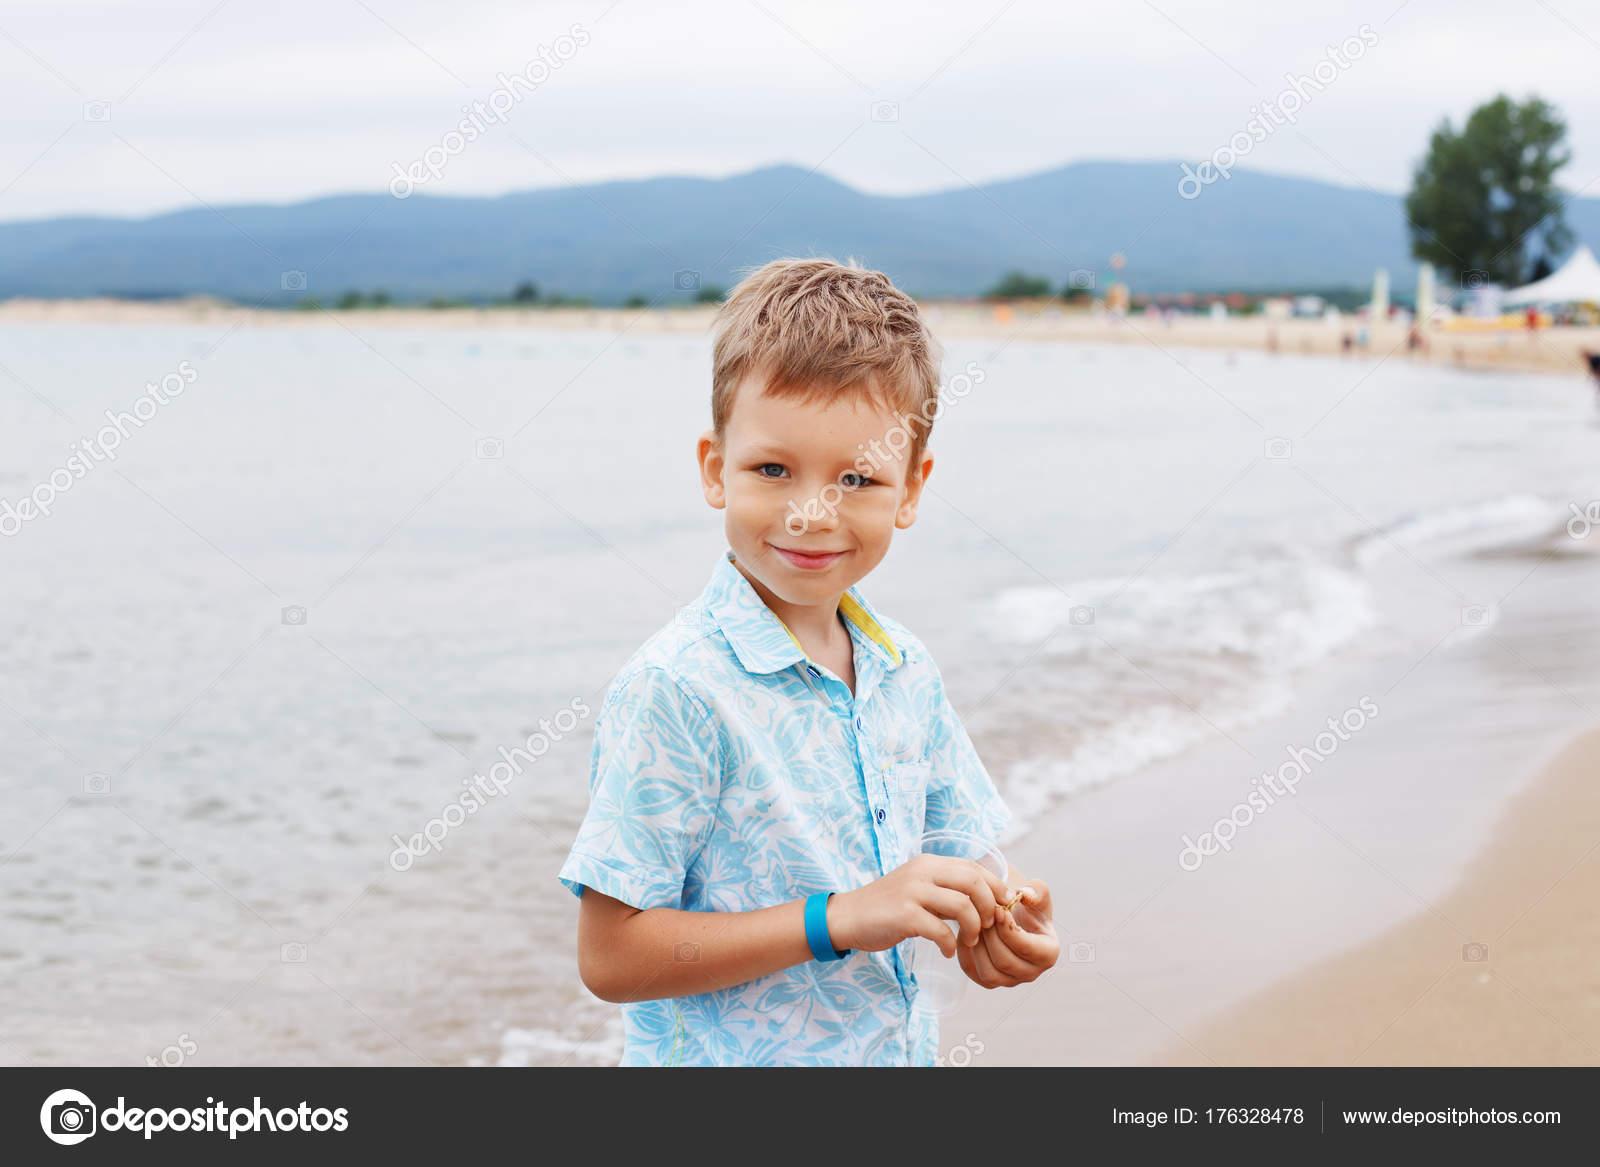 59e01d32a Little boy in shirt and shorts on the beach sand. Little boy hav — Stock